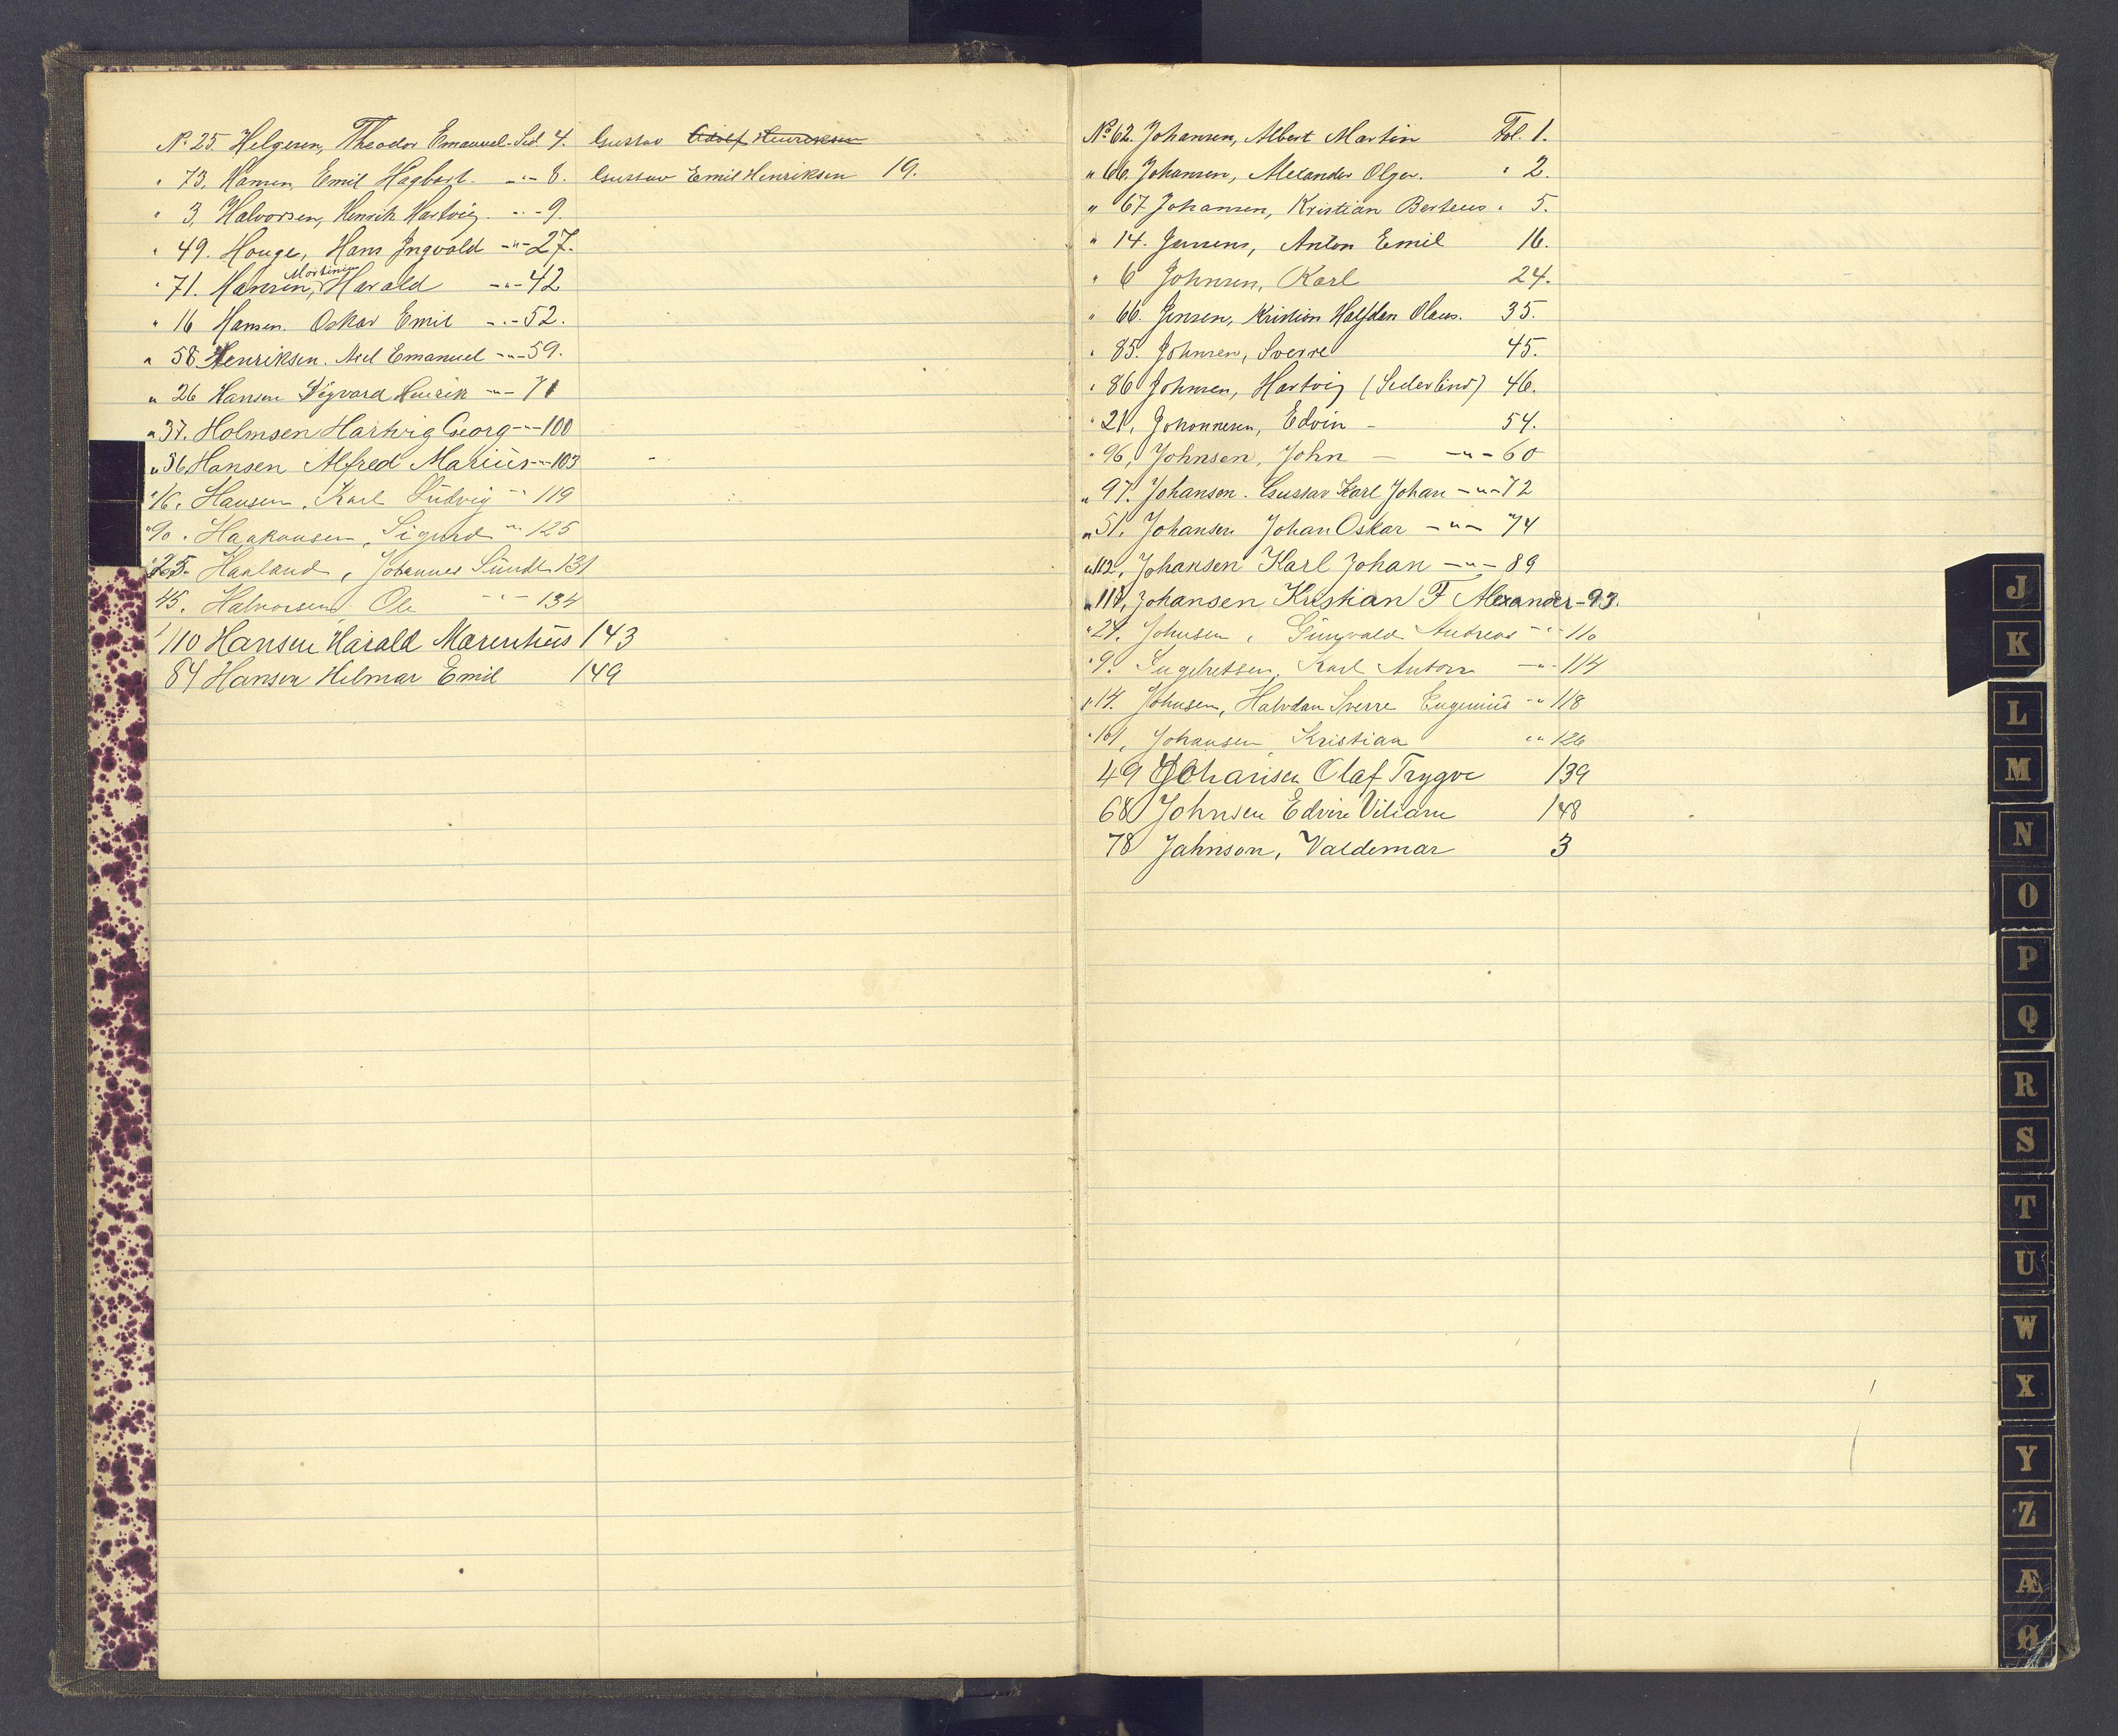 SAH, Toftes Gave, F/Fc/L0004: Elevprotokoll, 1885-1897, s. upaginert